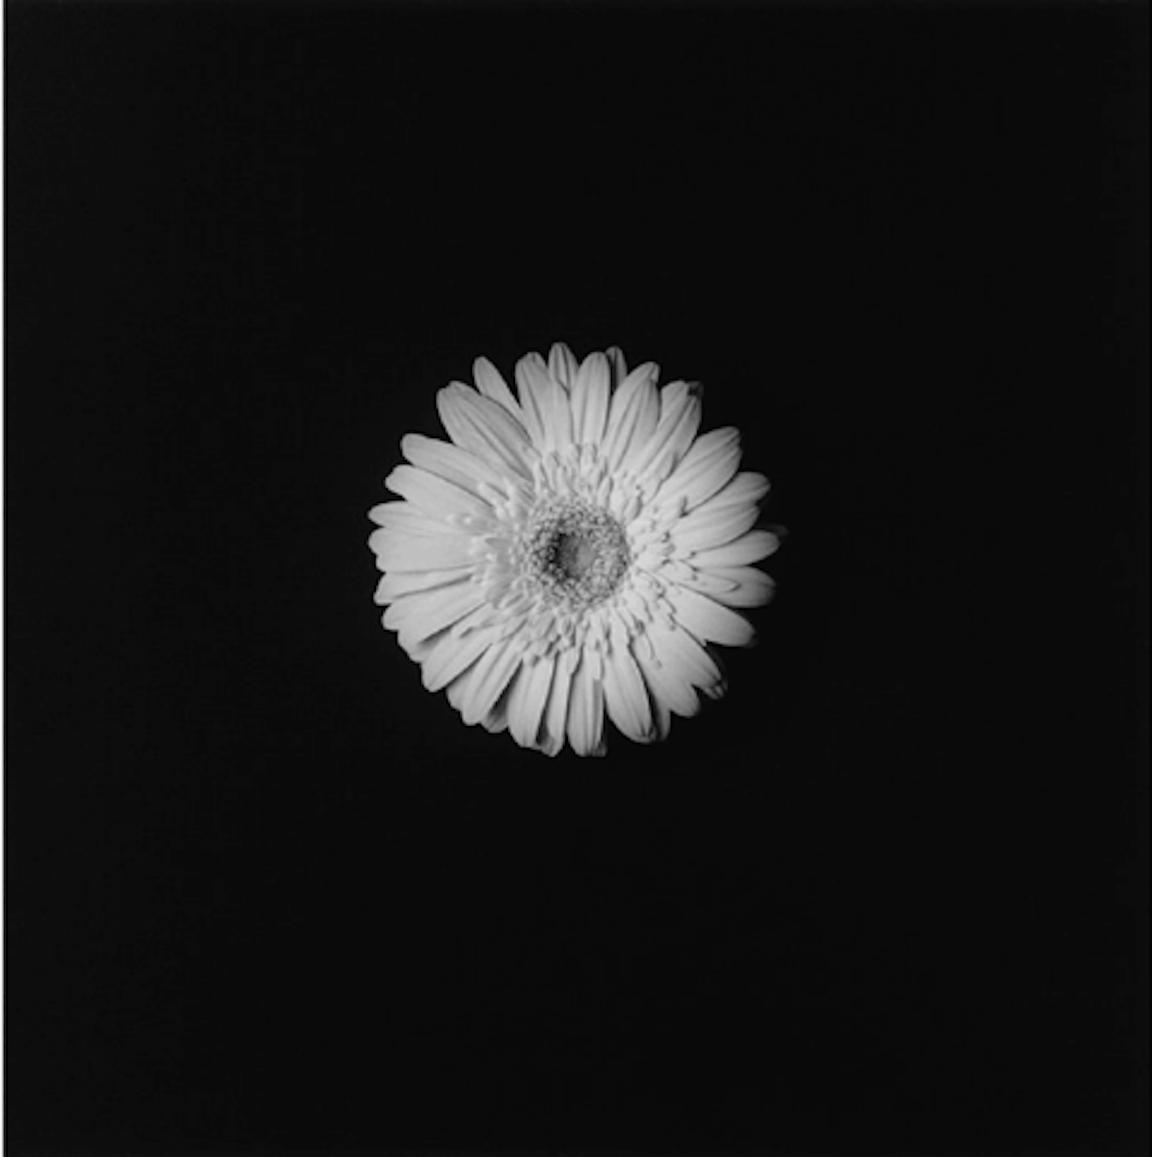 Flower 1984 by Robert Mapplethorpe